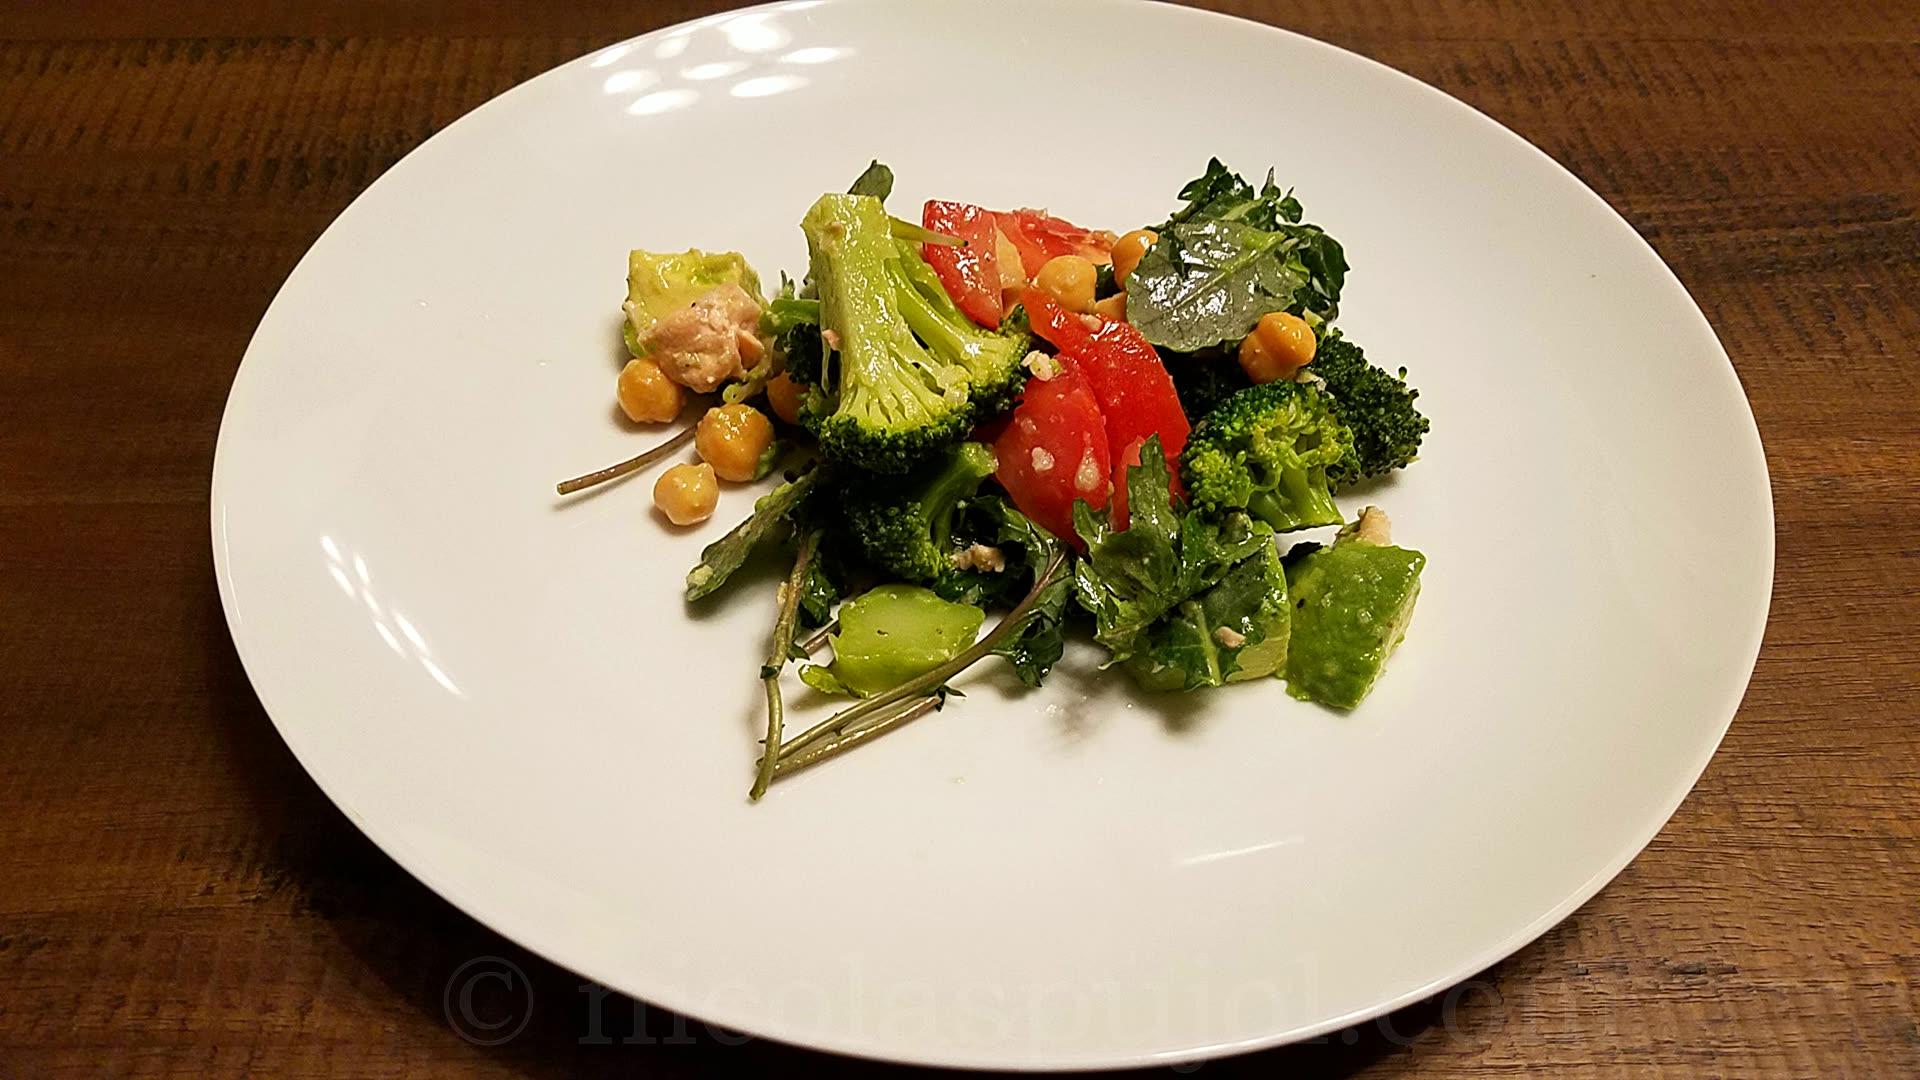 Garbanzo beans avocado tomato salad with lemon dressing